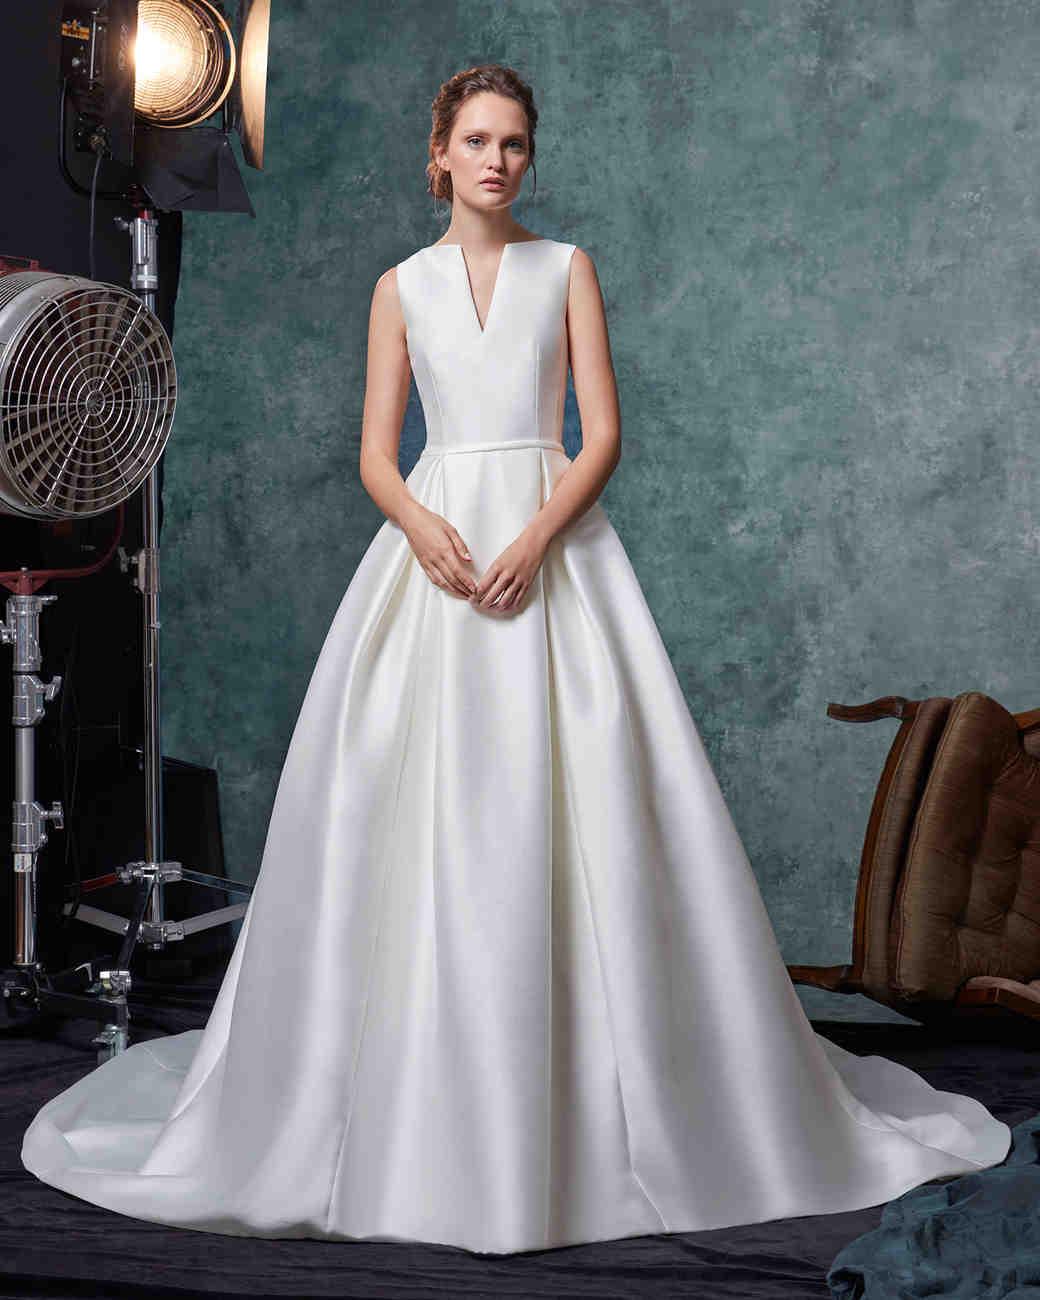 sareh nouri dress fall 2019 notched high neck ball gown